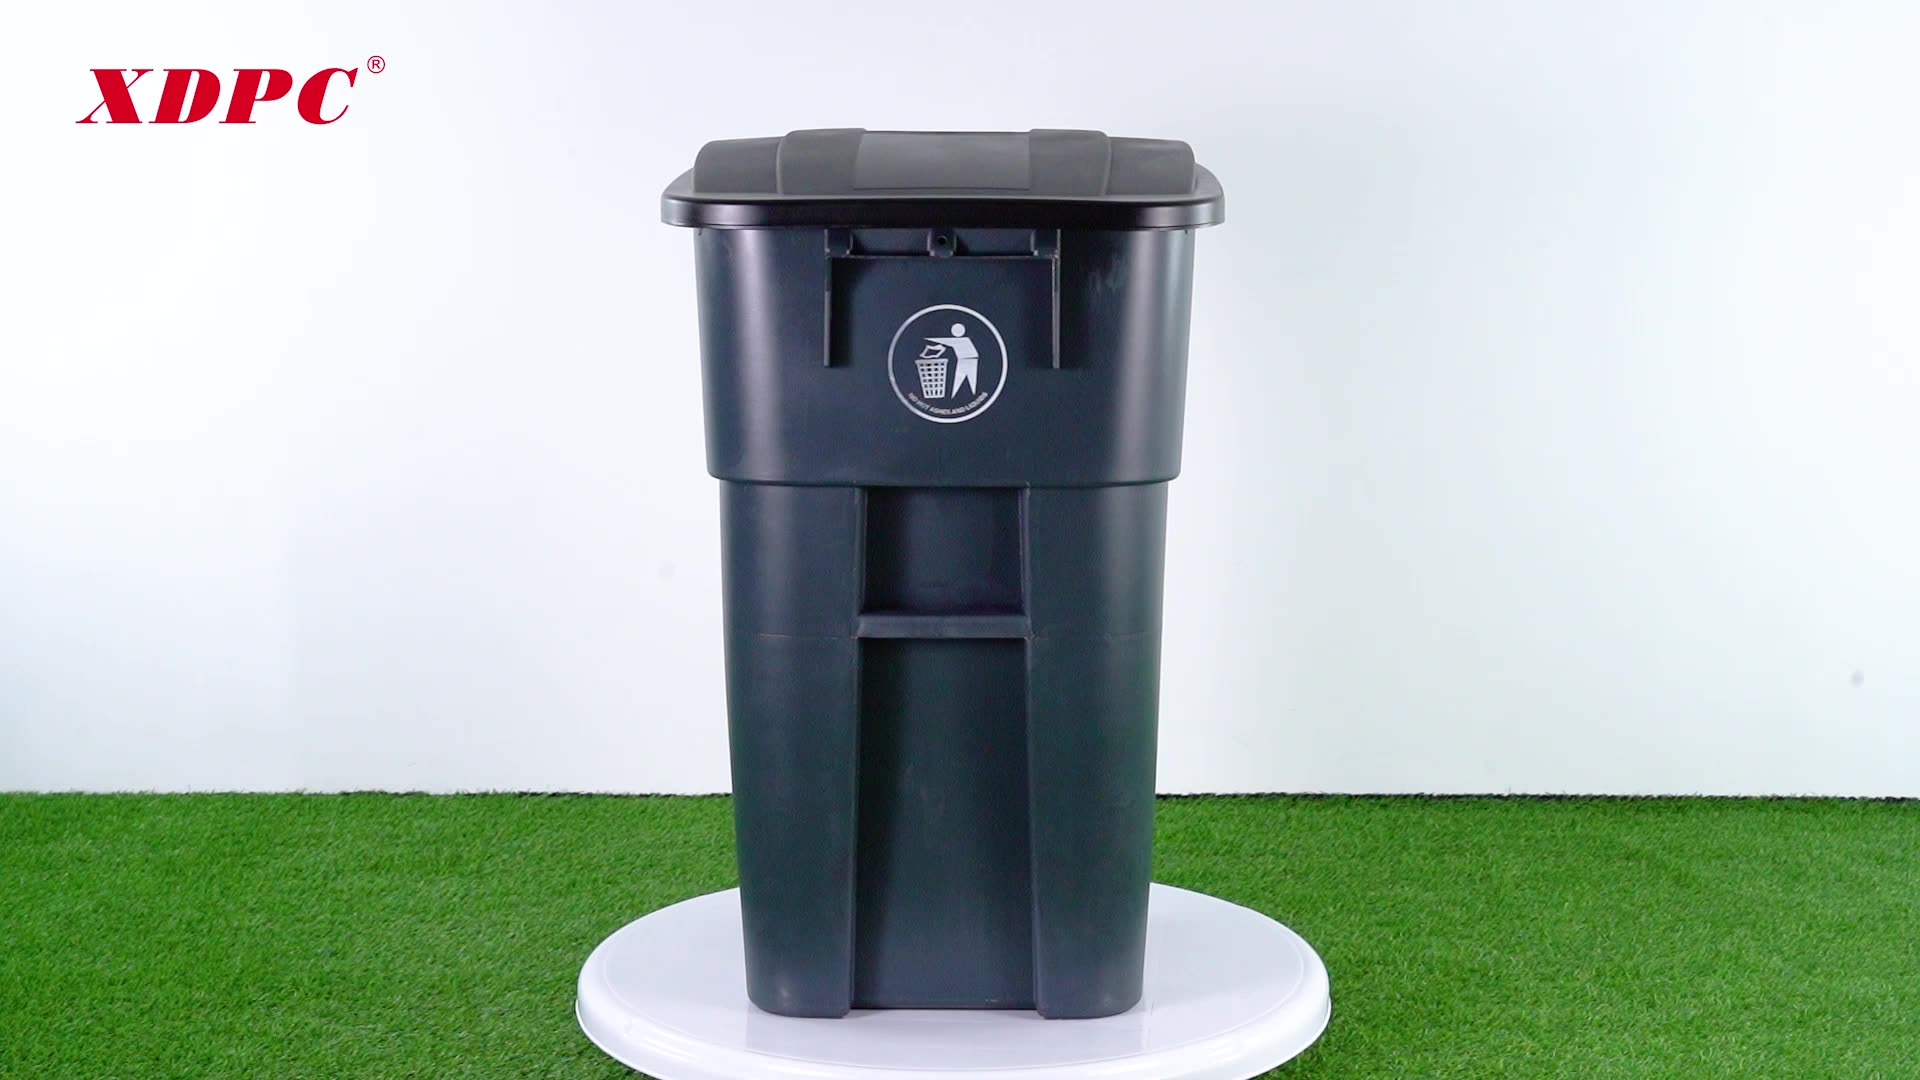 Waterproof north american style large plastic outdoor street dustbin garbage waste bin trash cans